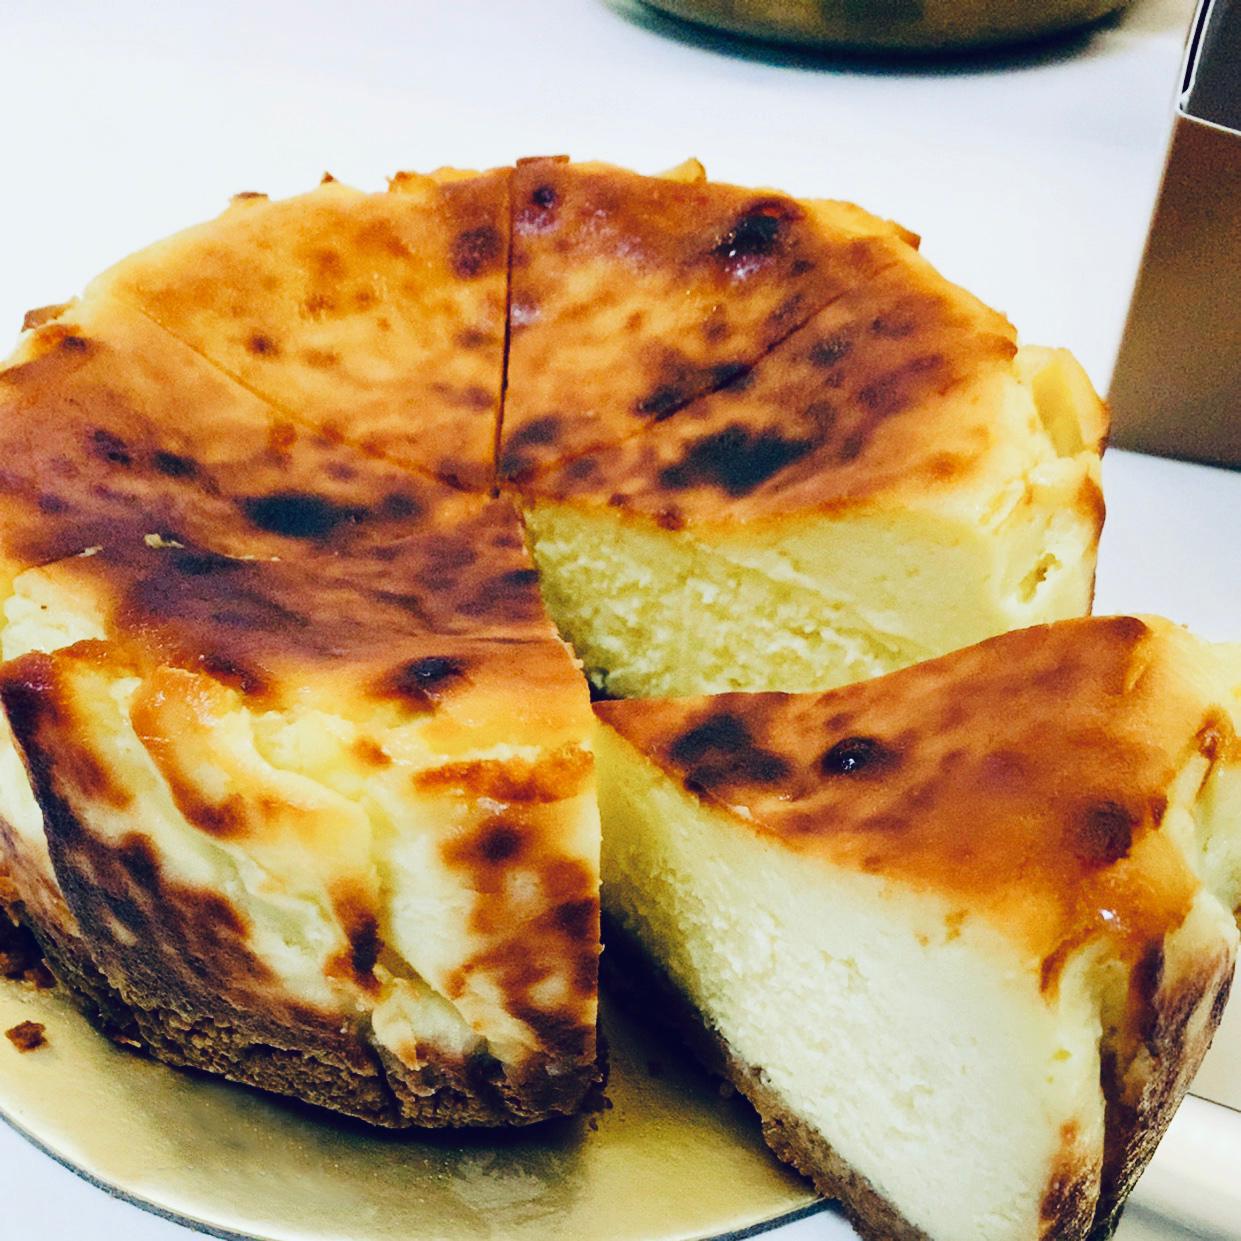 Burnt-Cheesecake-1.jpg